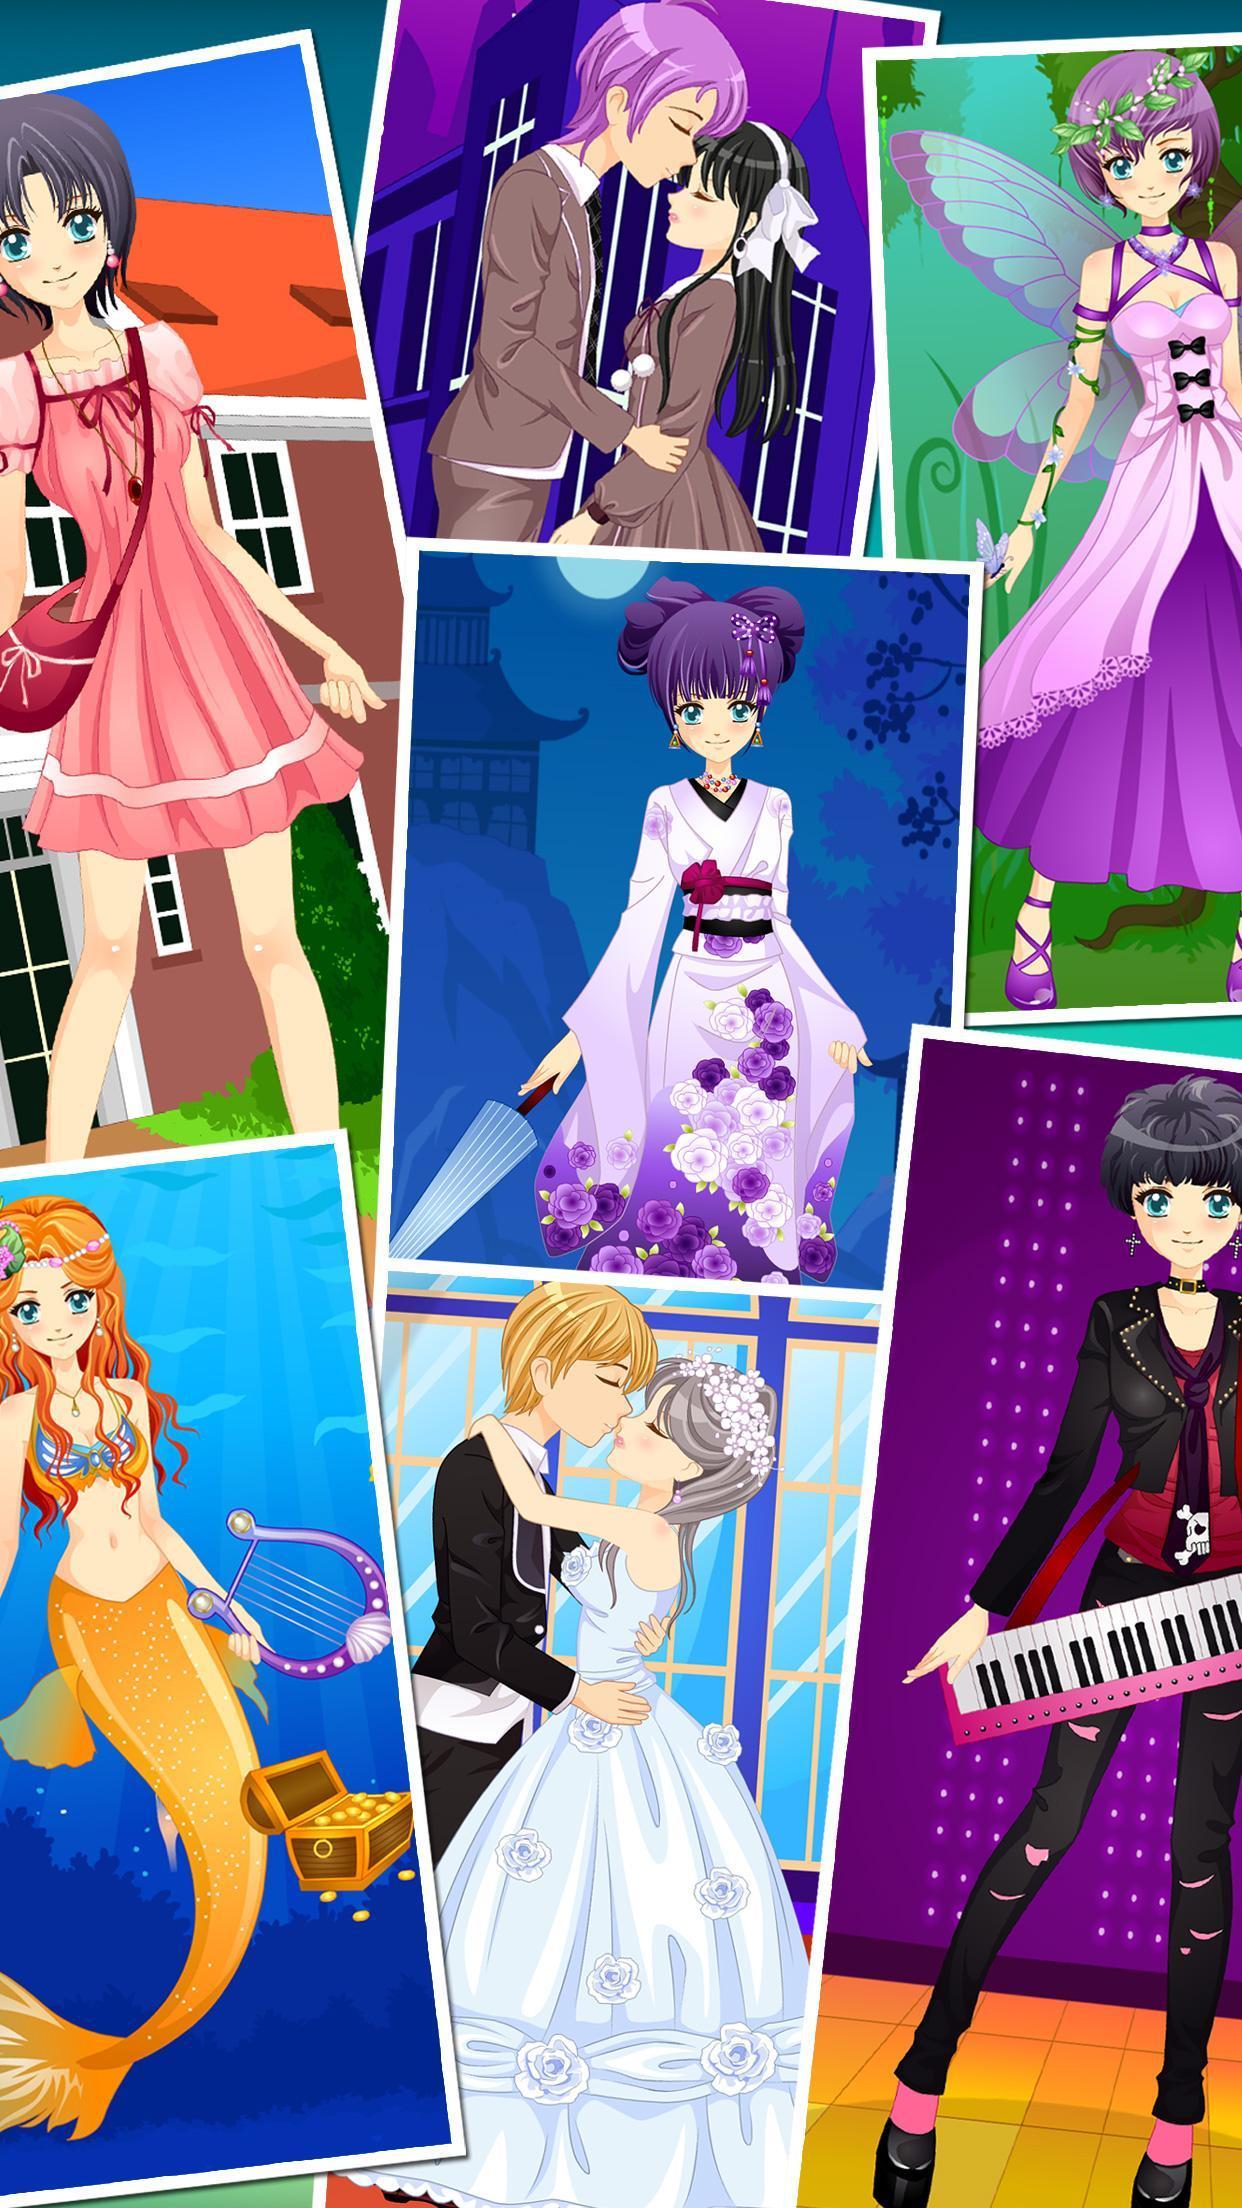 Anime Dress Up Games For Girls - Couple Love Kiss 3.3 Screenshot 17